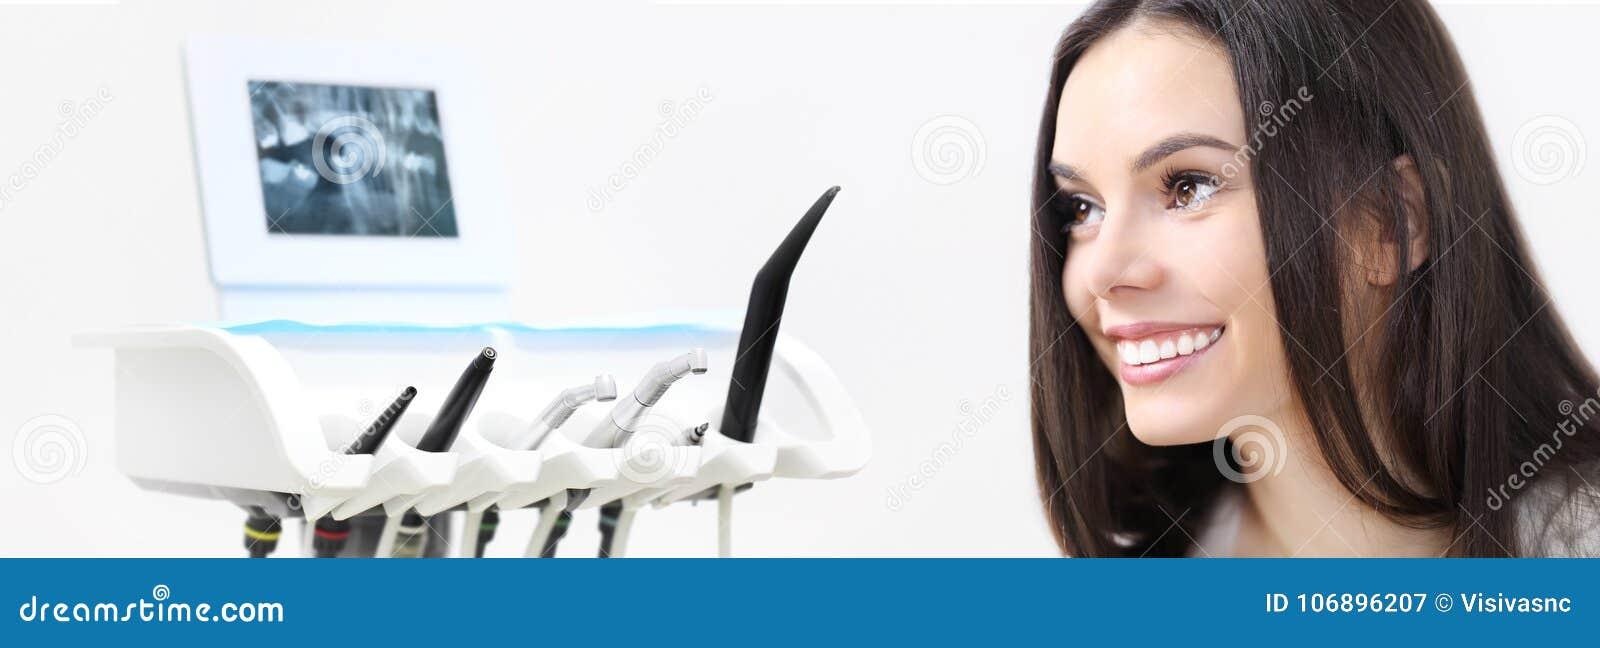 Tandzorgconcept, mooie glimlachende vrouw op tandartskliniek B